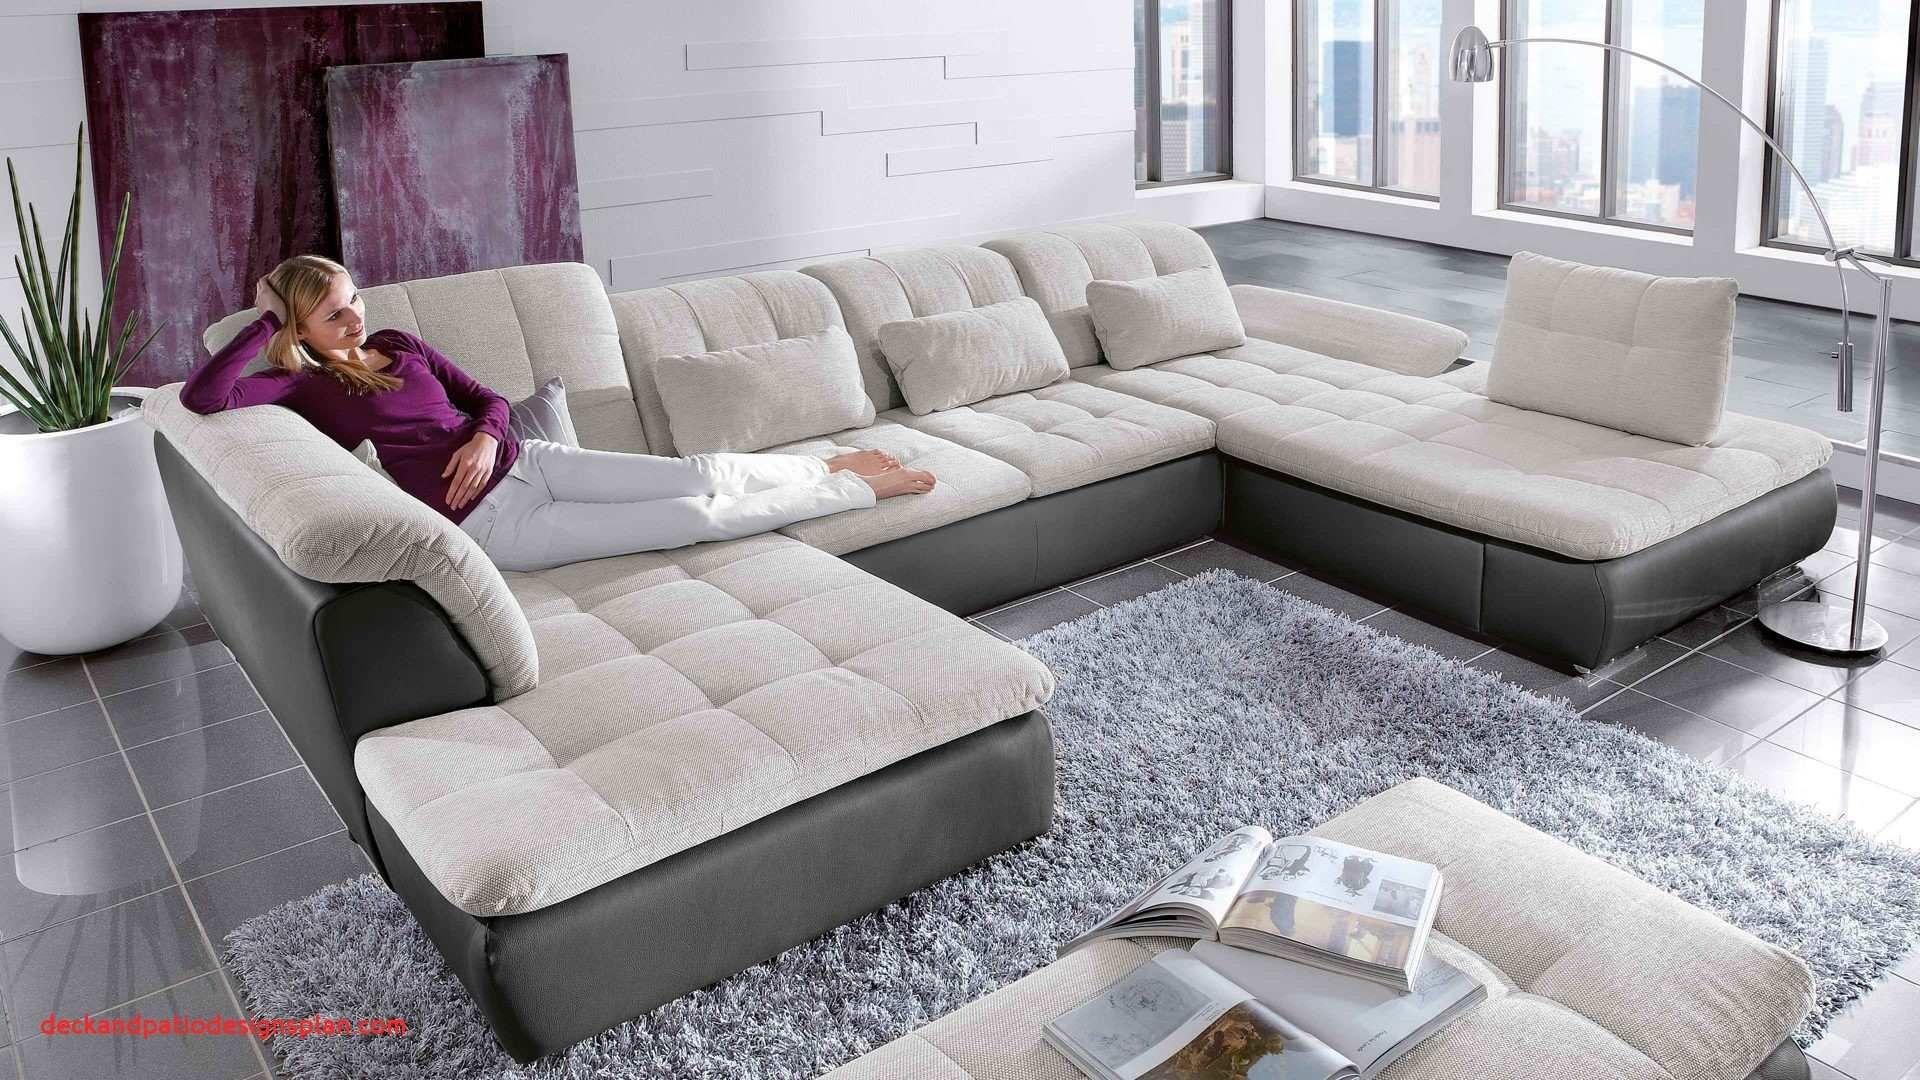 71 Magnificent Lager Von Schlafsofa U Form Sofa Planejado